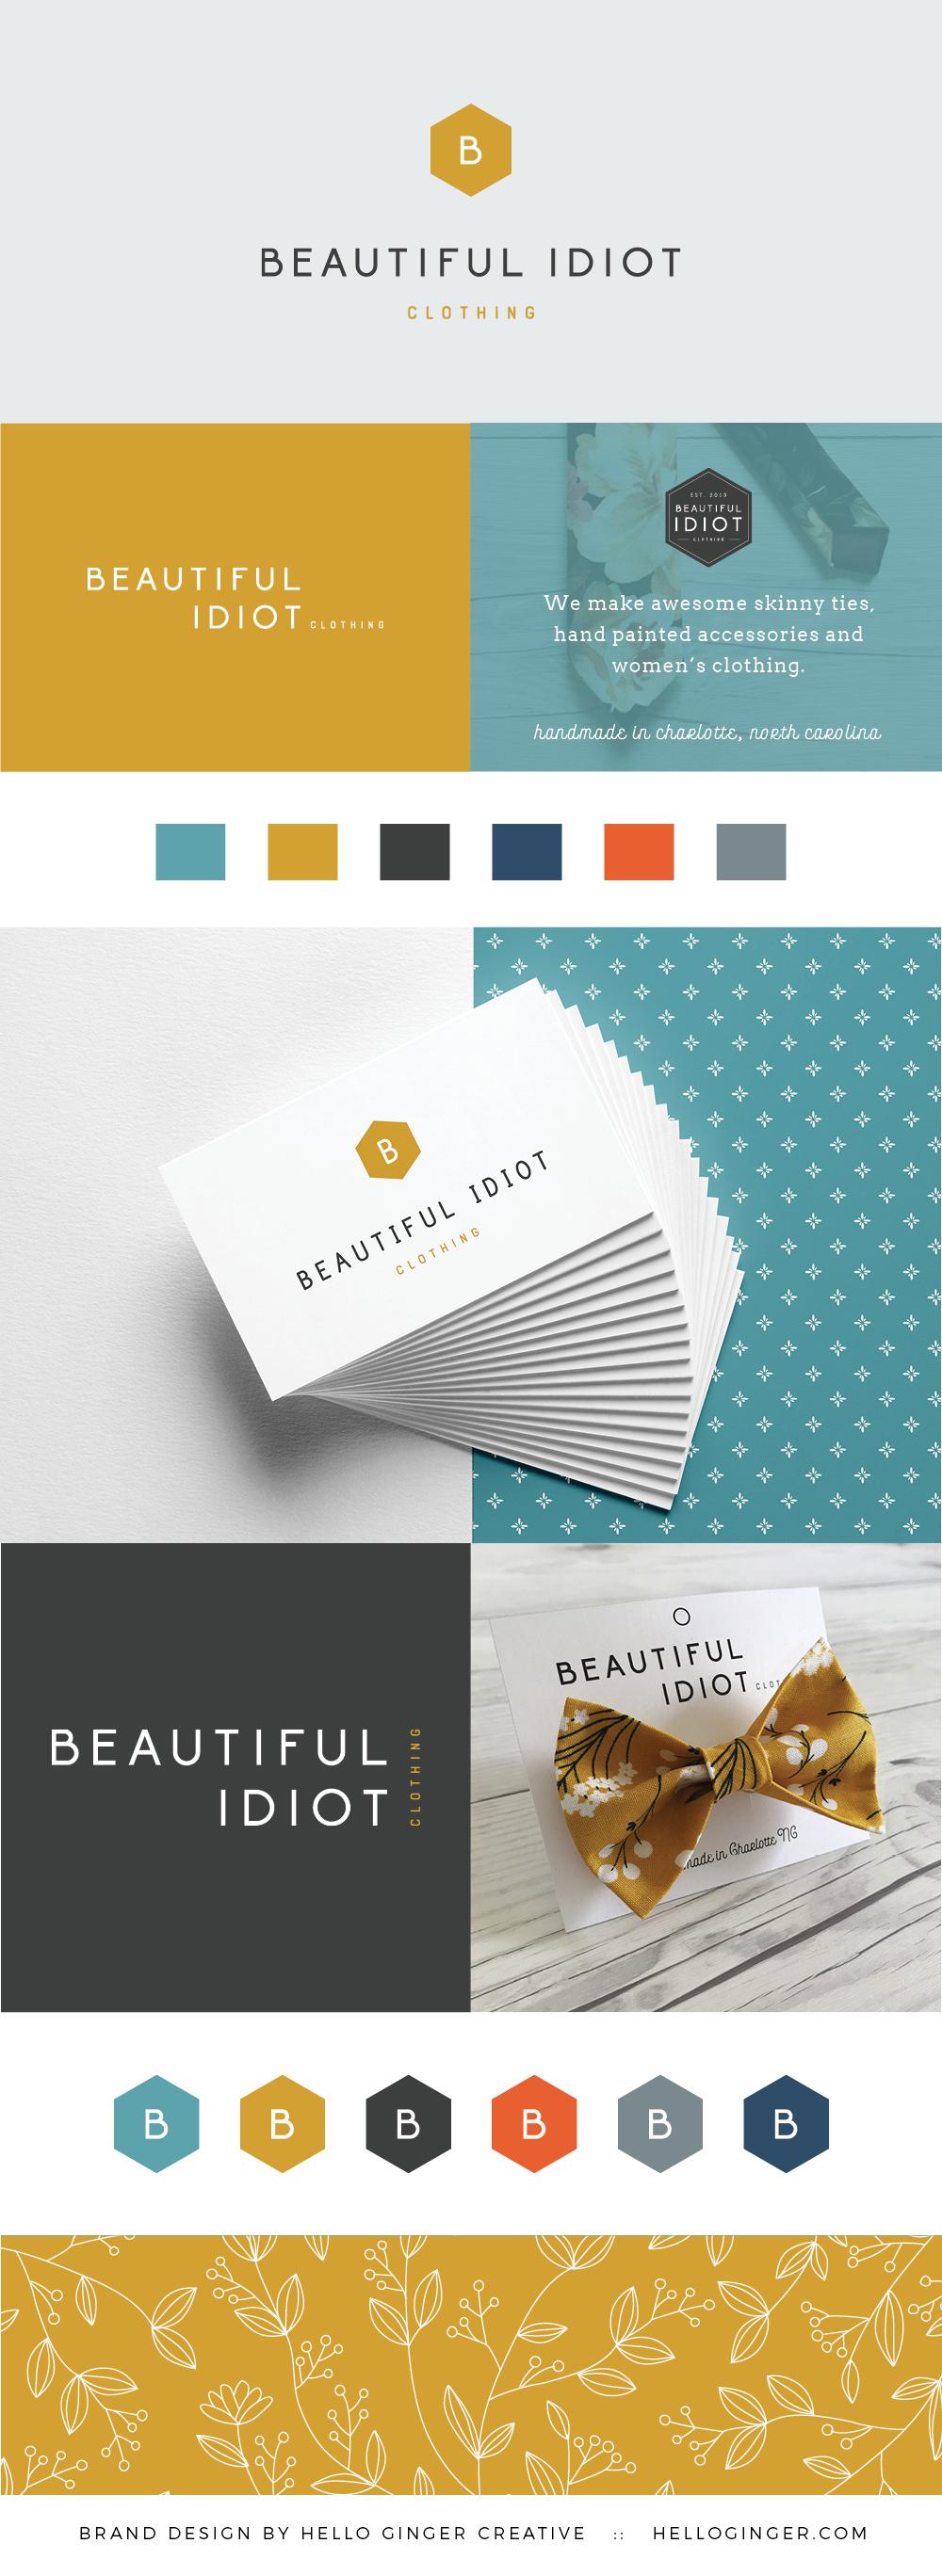 BeautifulIdiot_Branding.jpg